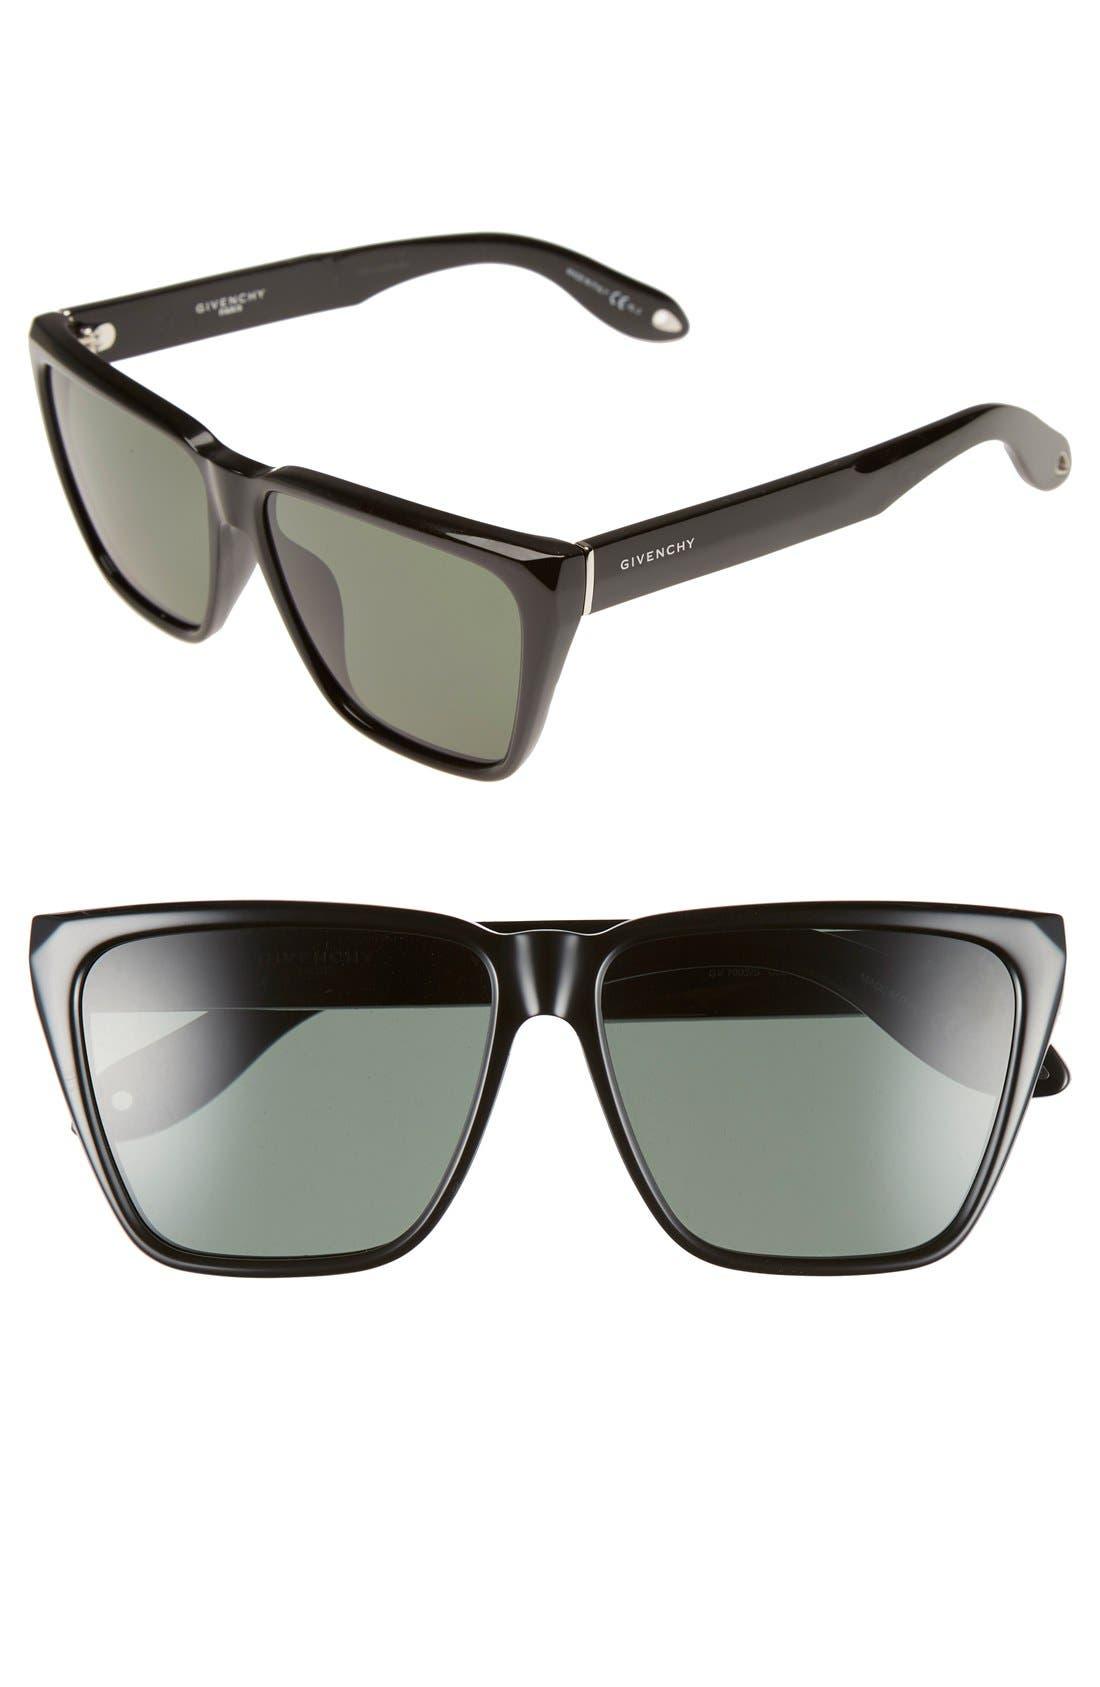 Main Image - Givenchy 58mm Flat Top Sunglasses